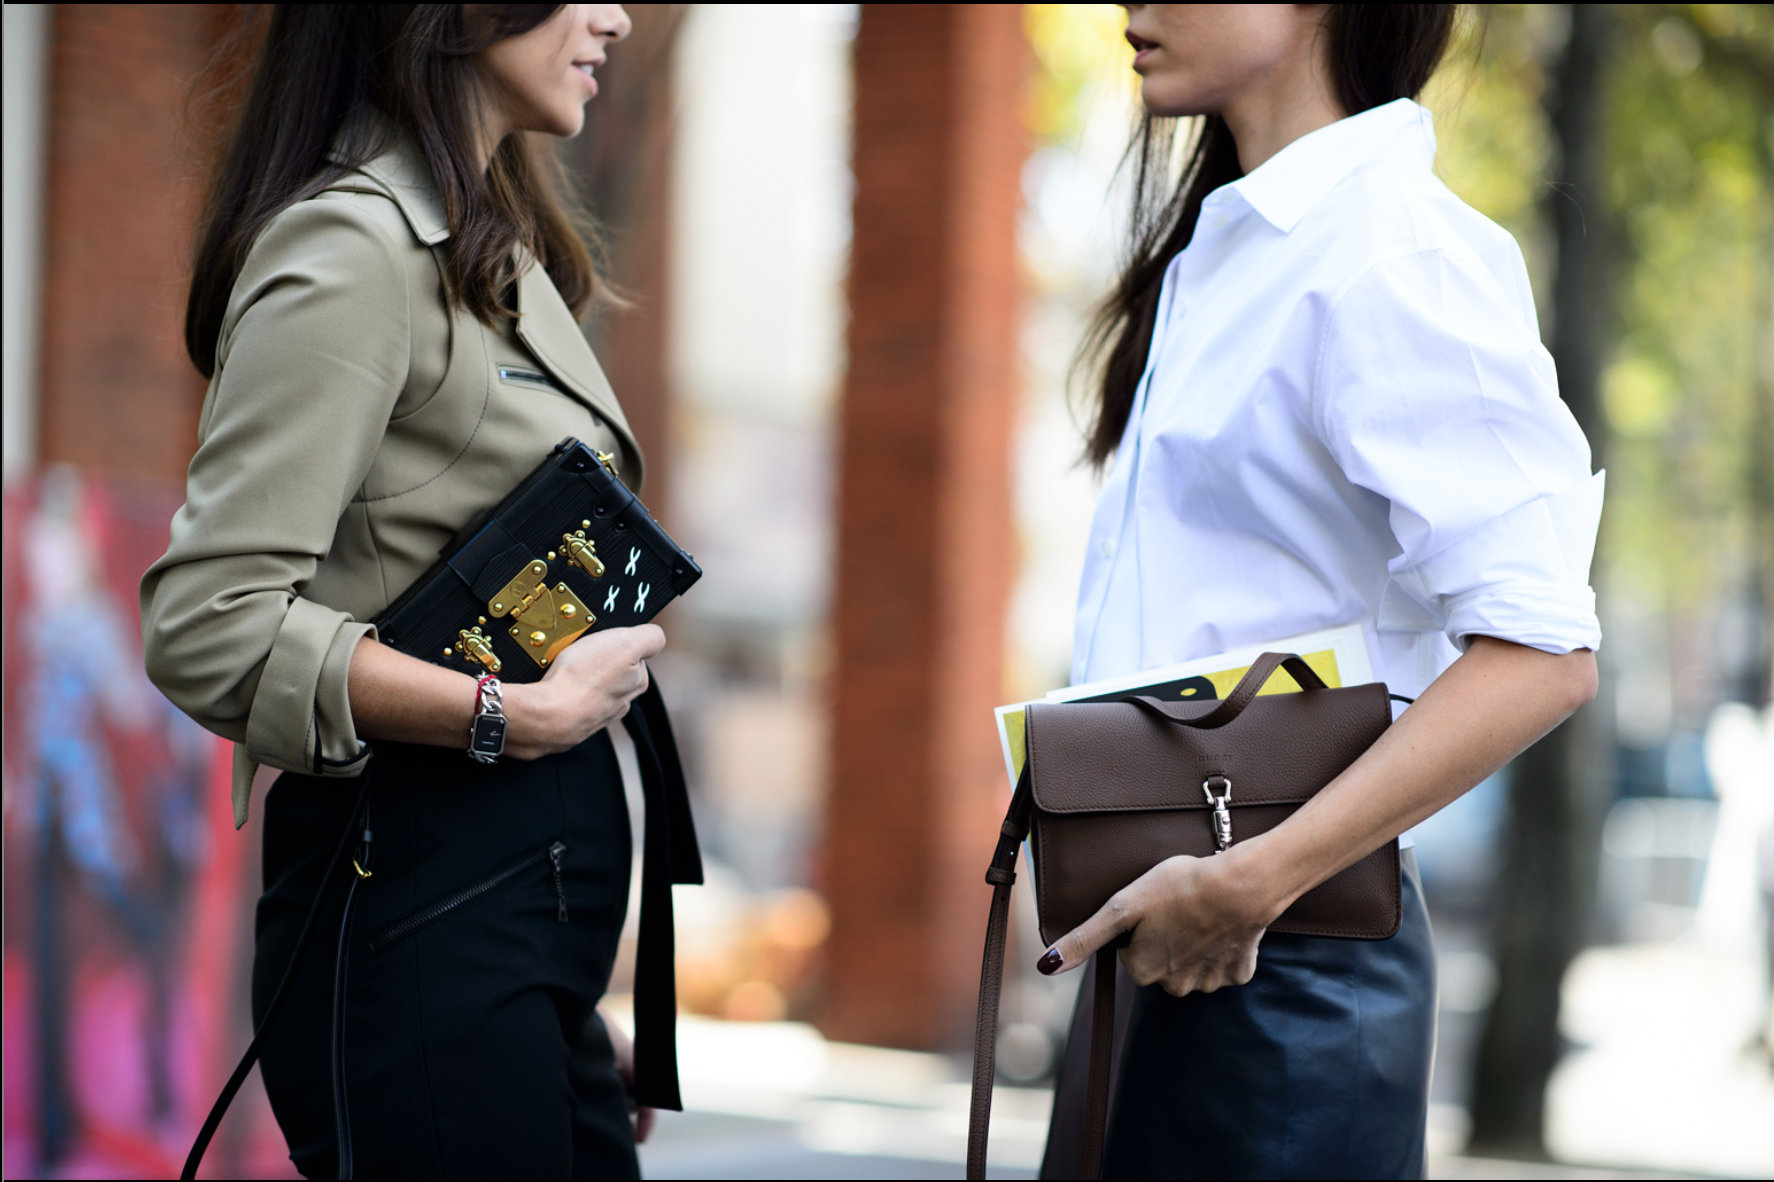 wmagazine.com:fashion:street-style:2014:09:paris-fashion-week-spring-2015-street-style:photos:slide:184:adam-katz